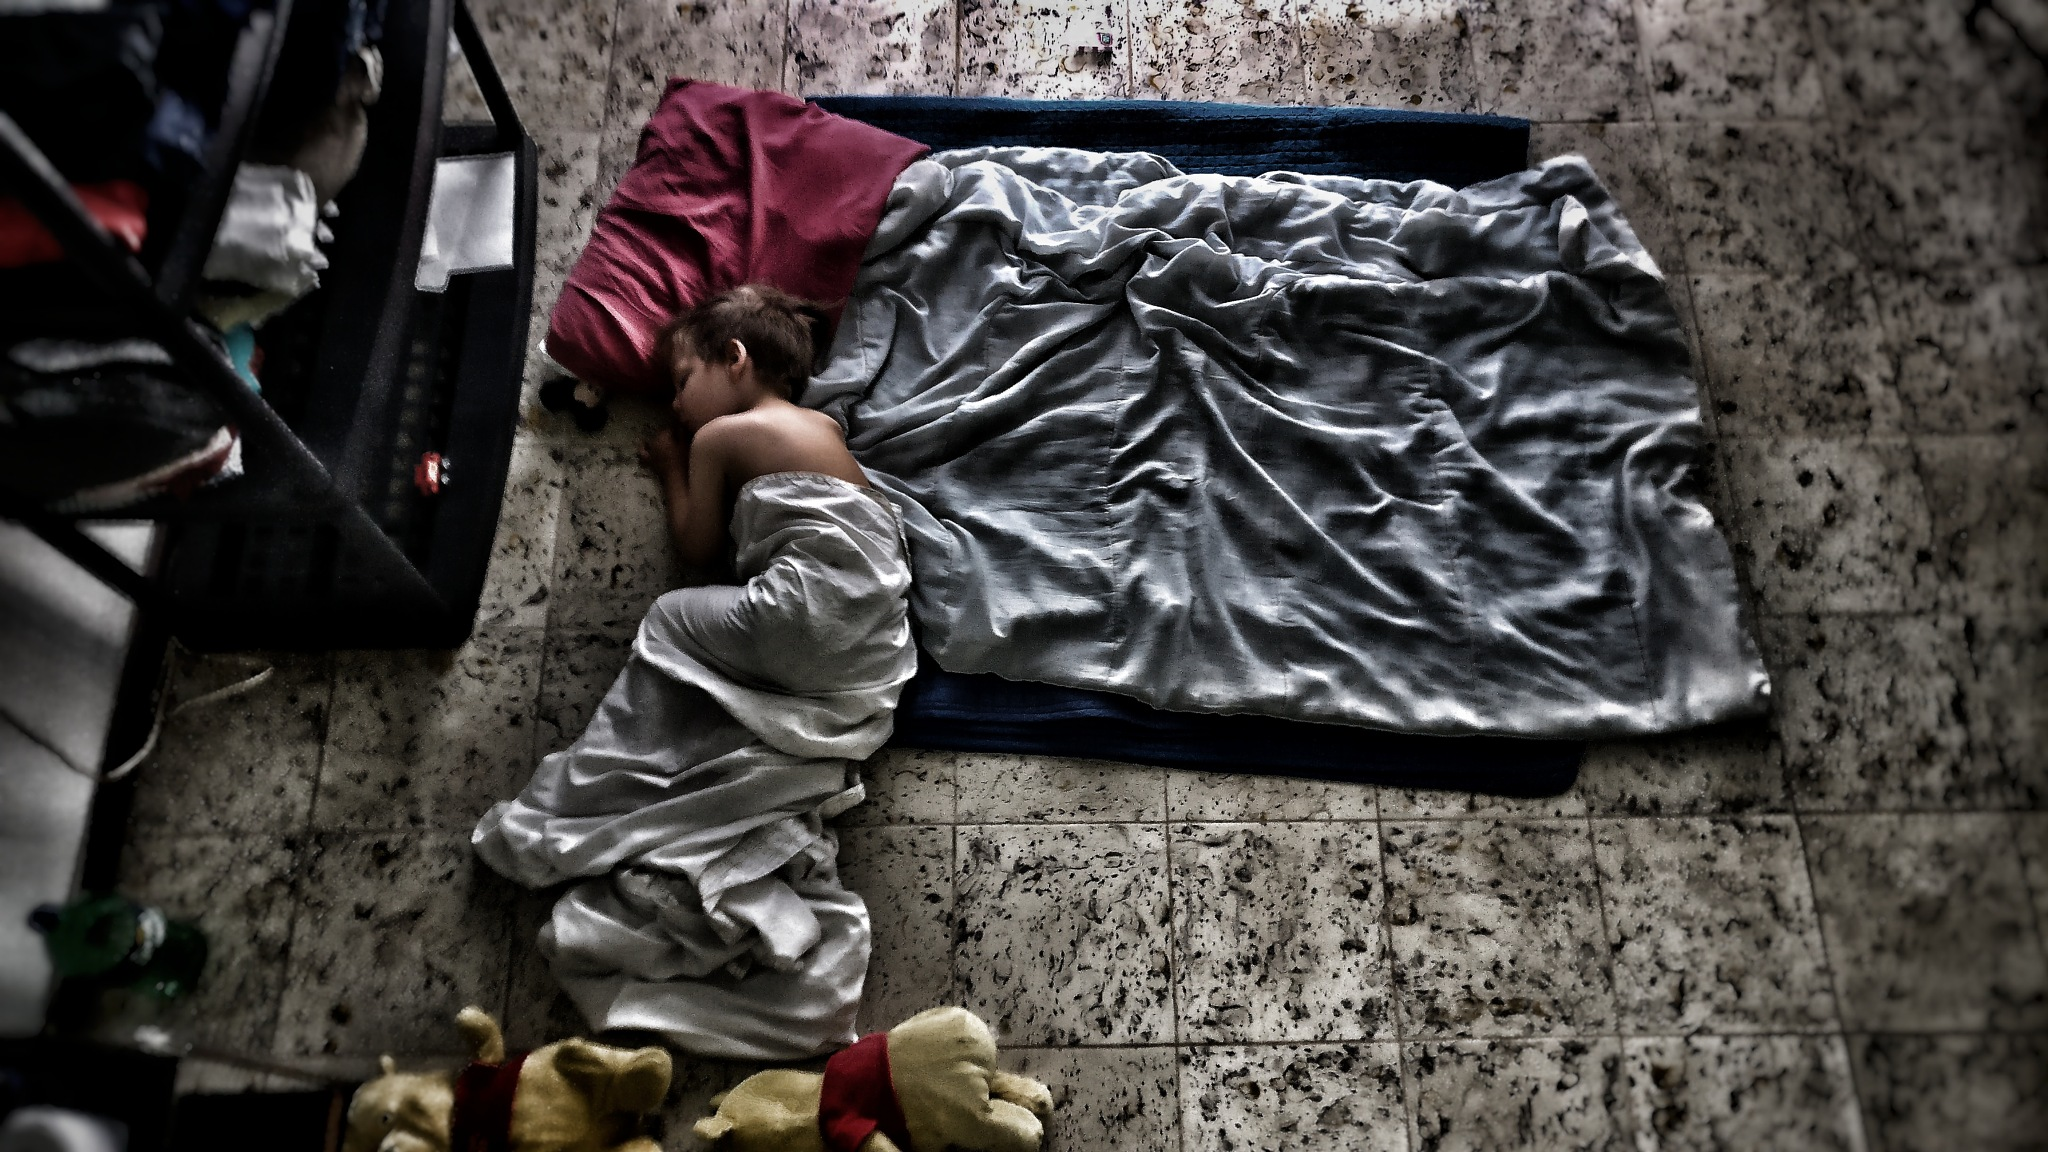 Sleeping on the floor by Ester Pelm